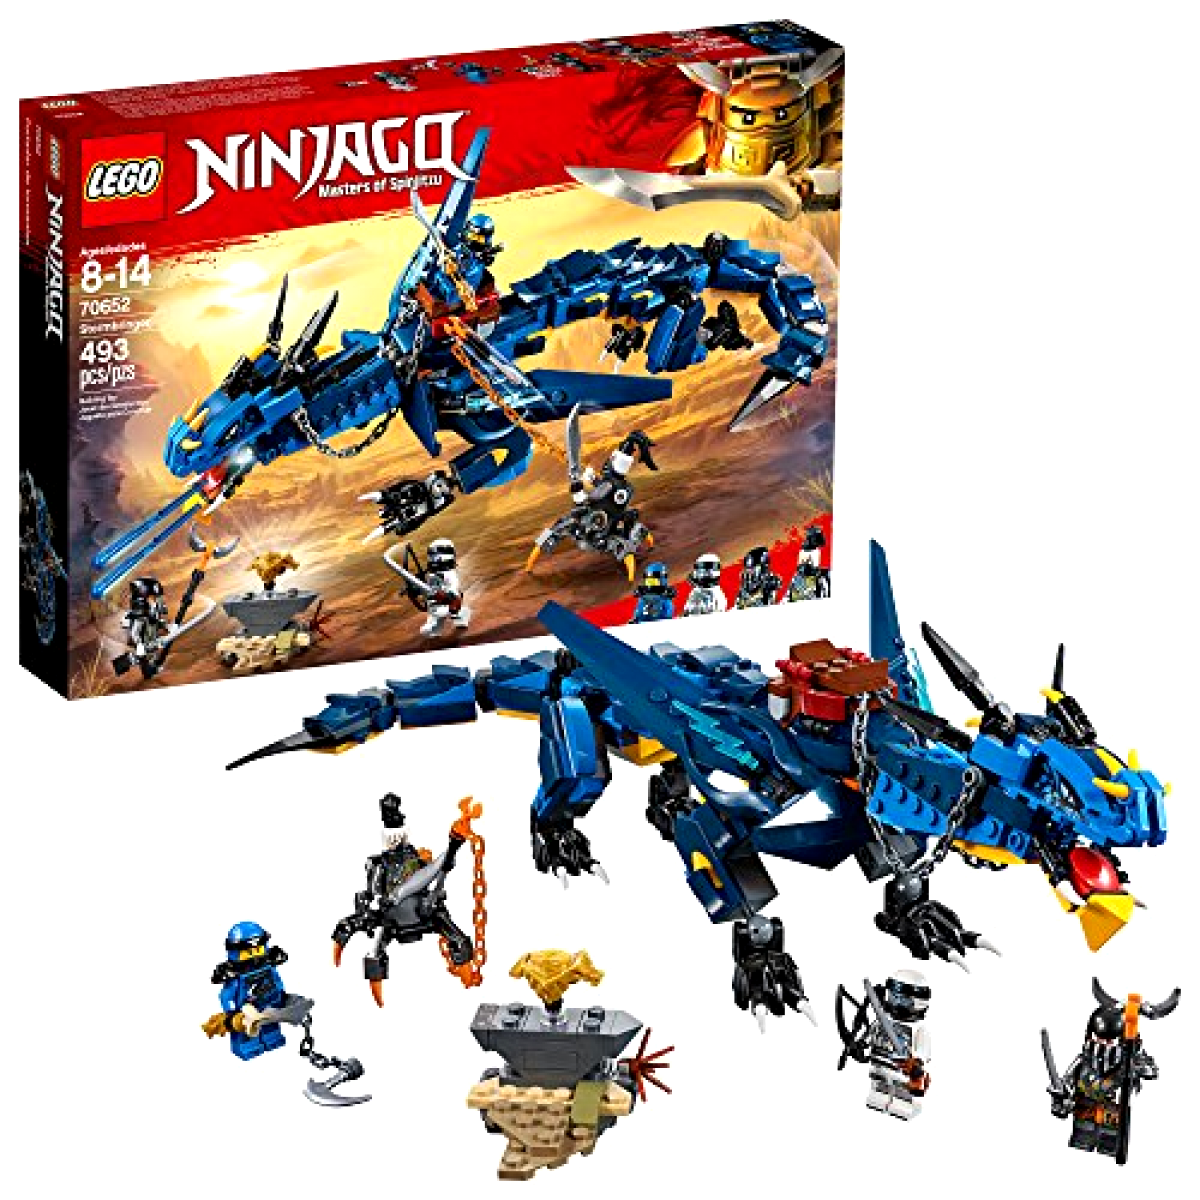 LEGO NINJAGO Masters of Spinjitzu   Stormbringer 70652 Ninja giocattolo costruzione Kit wi  sconto online